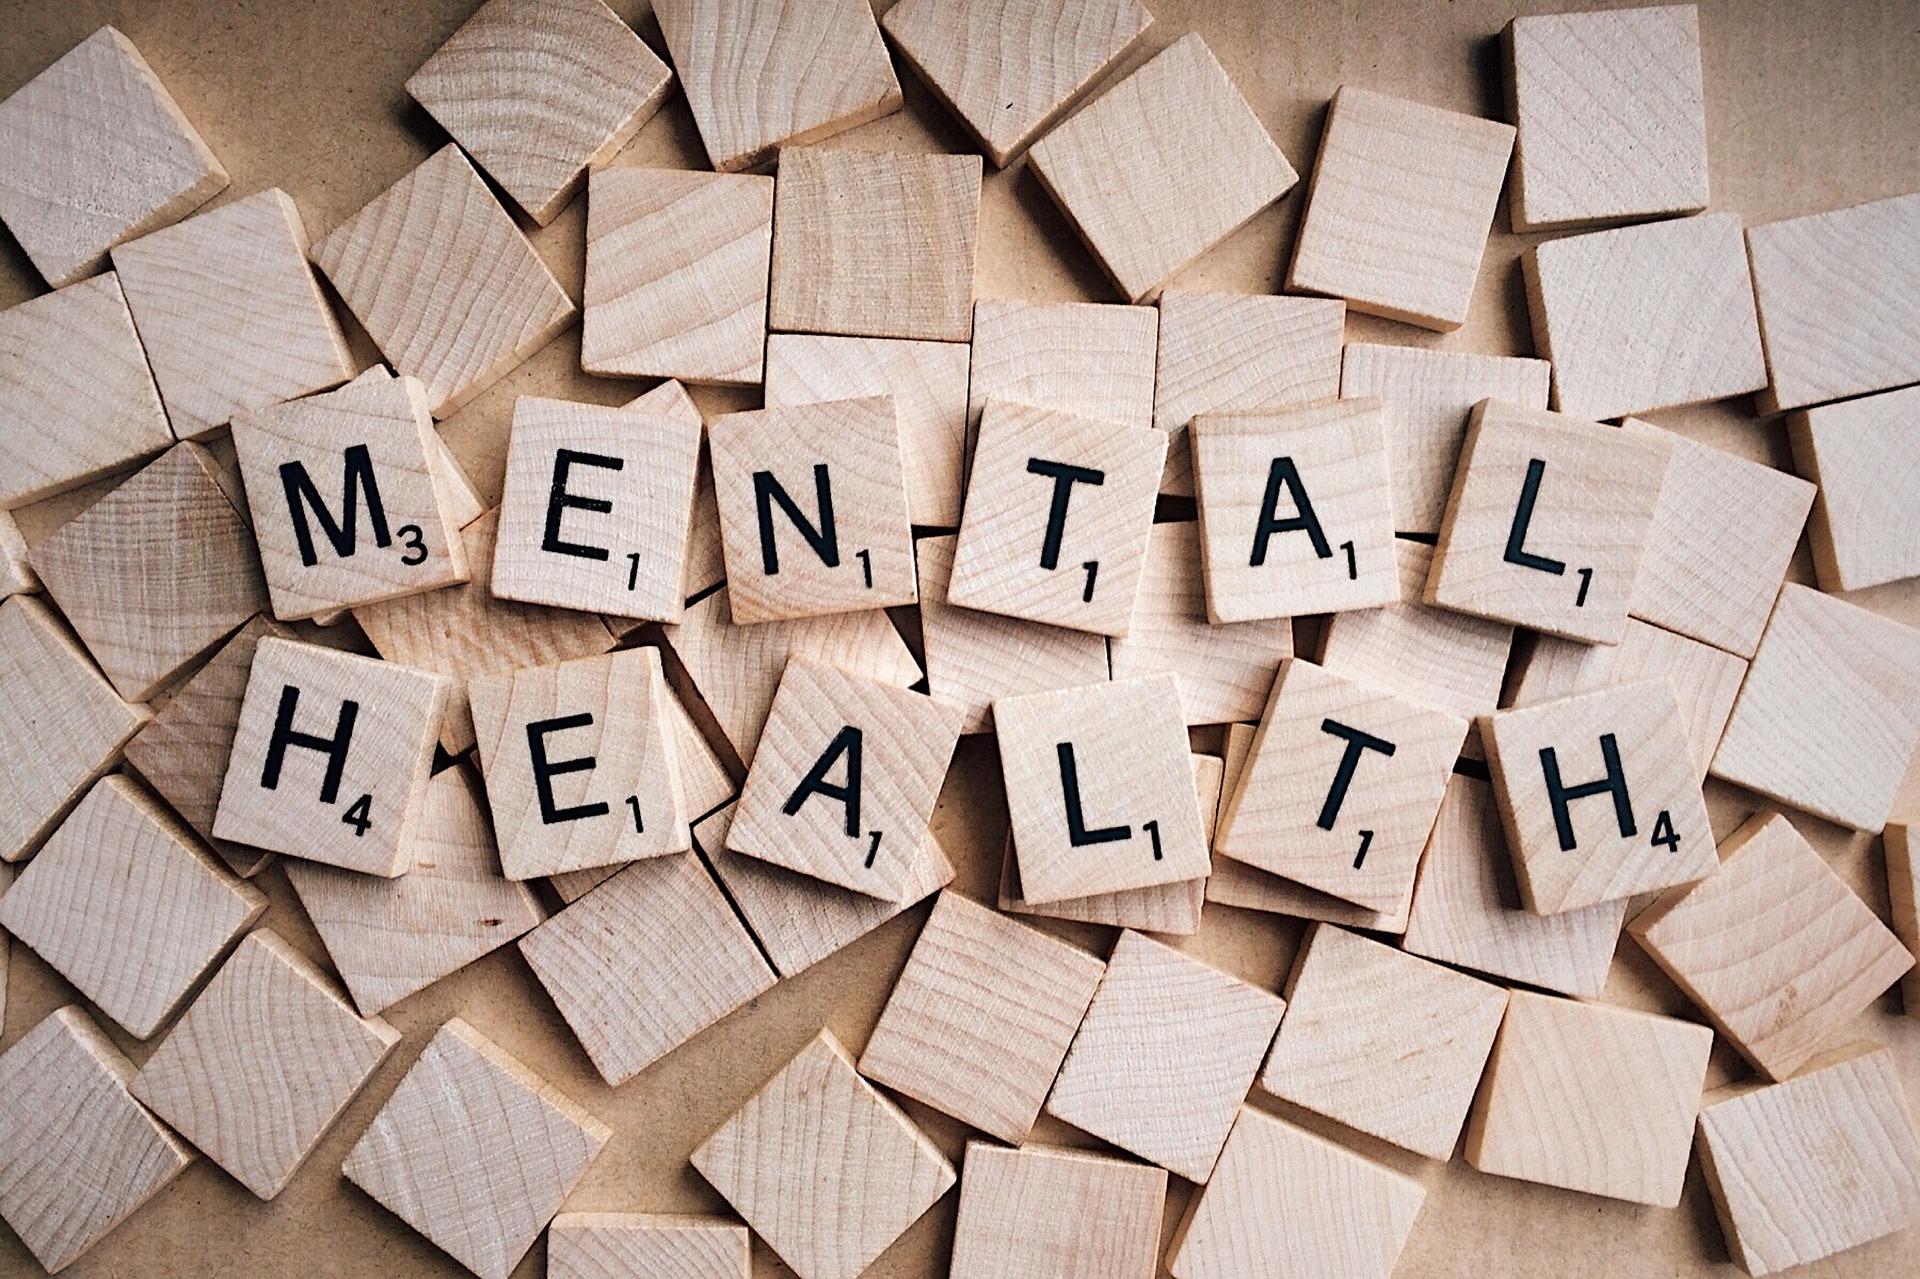 mental_health_2019924_1920